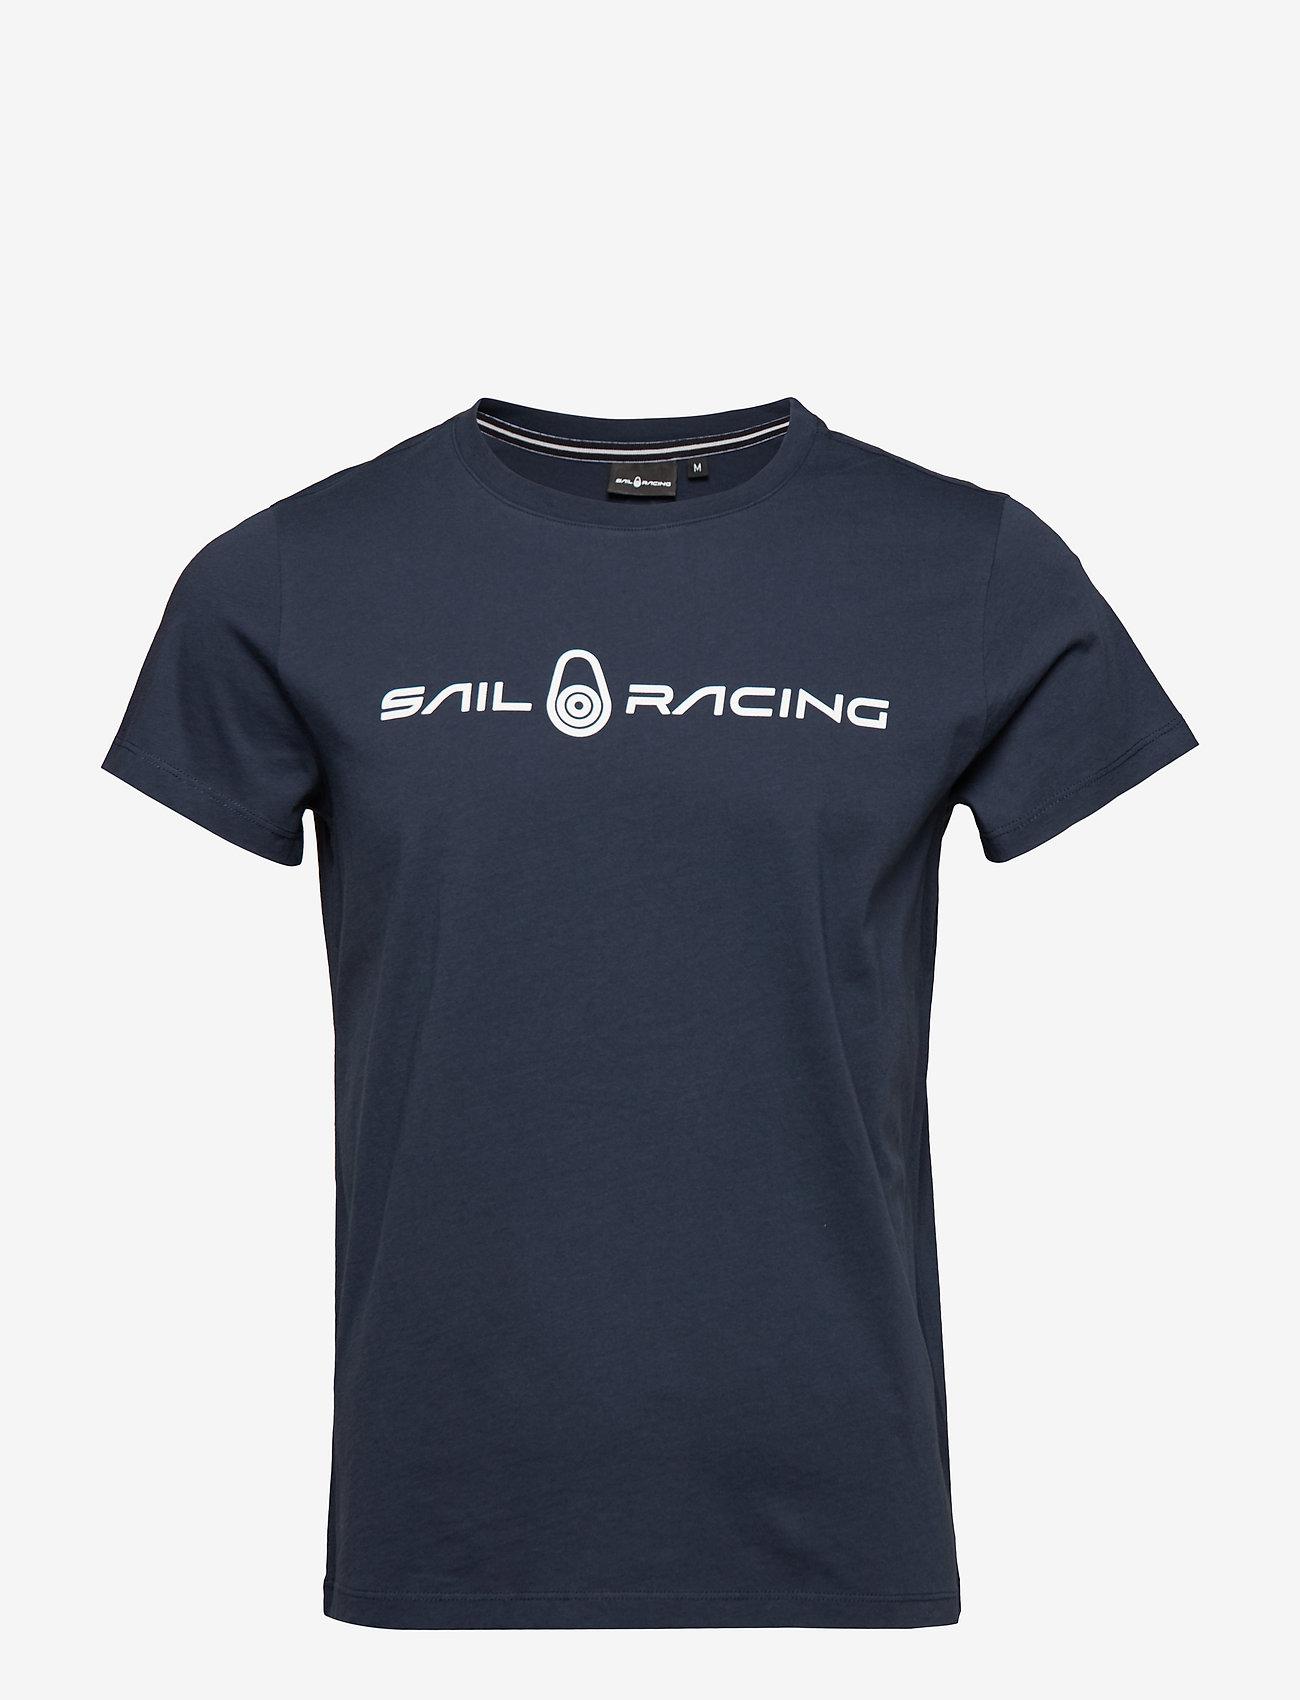 Sail Racing - BOWMAN TEE - sports tops - navy - 0